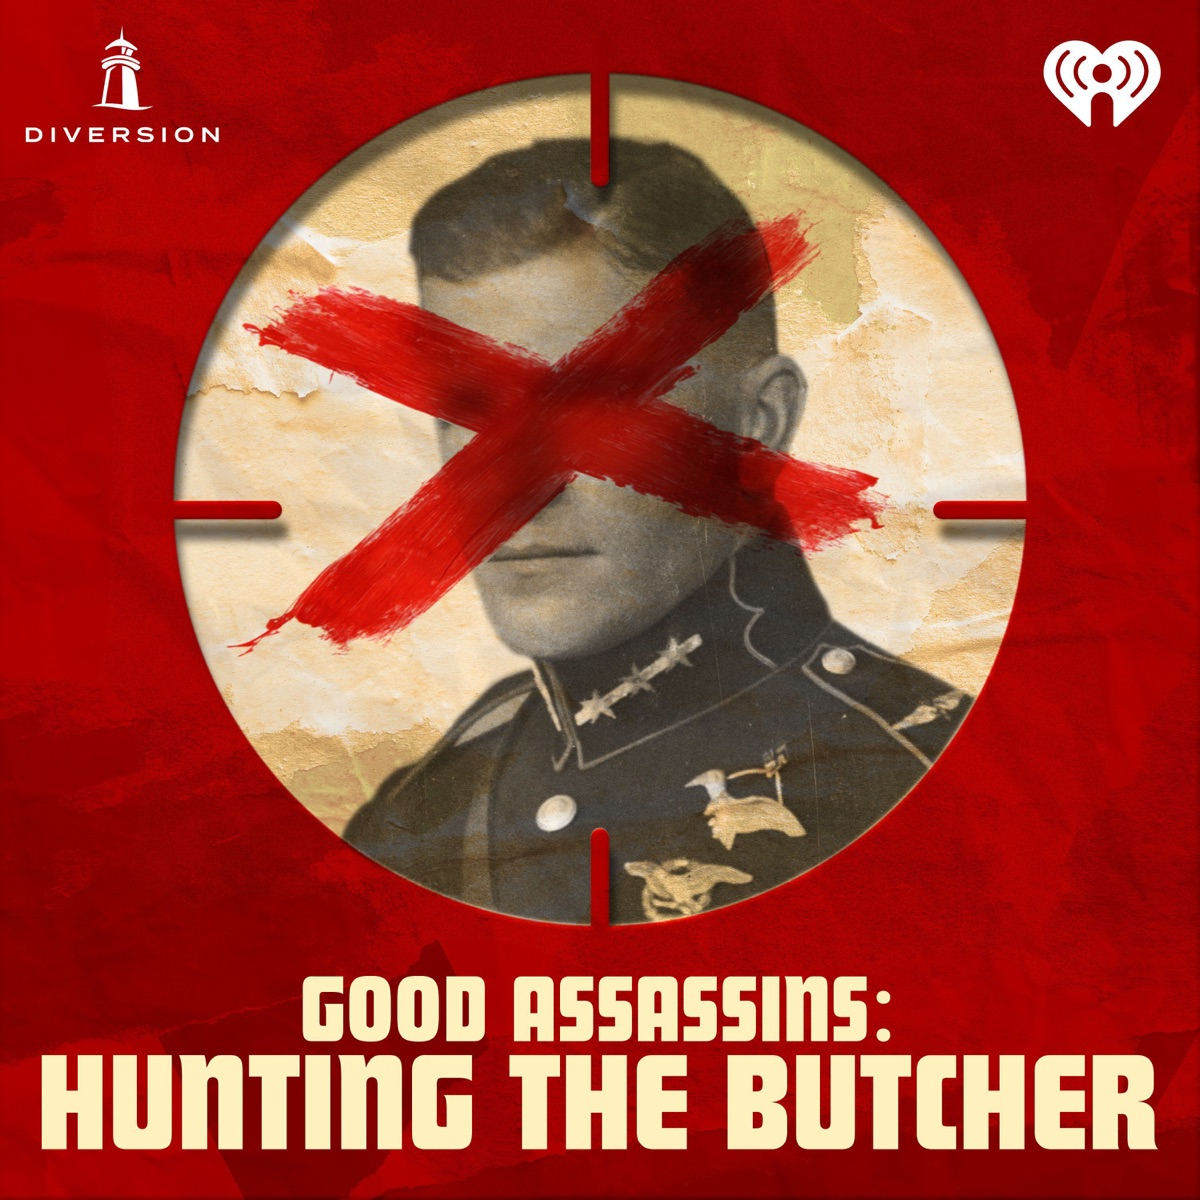 Good Assassins: Hunting the Butcher